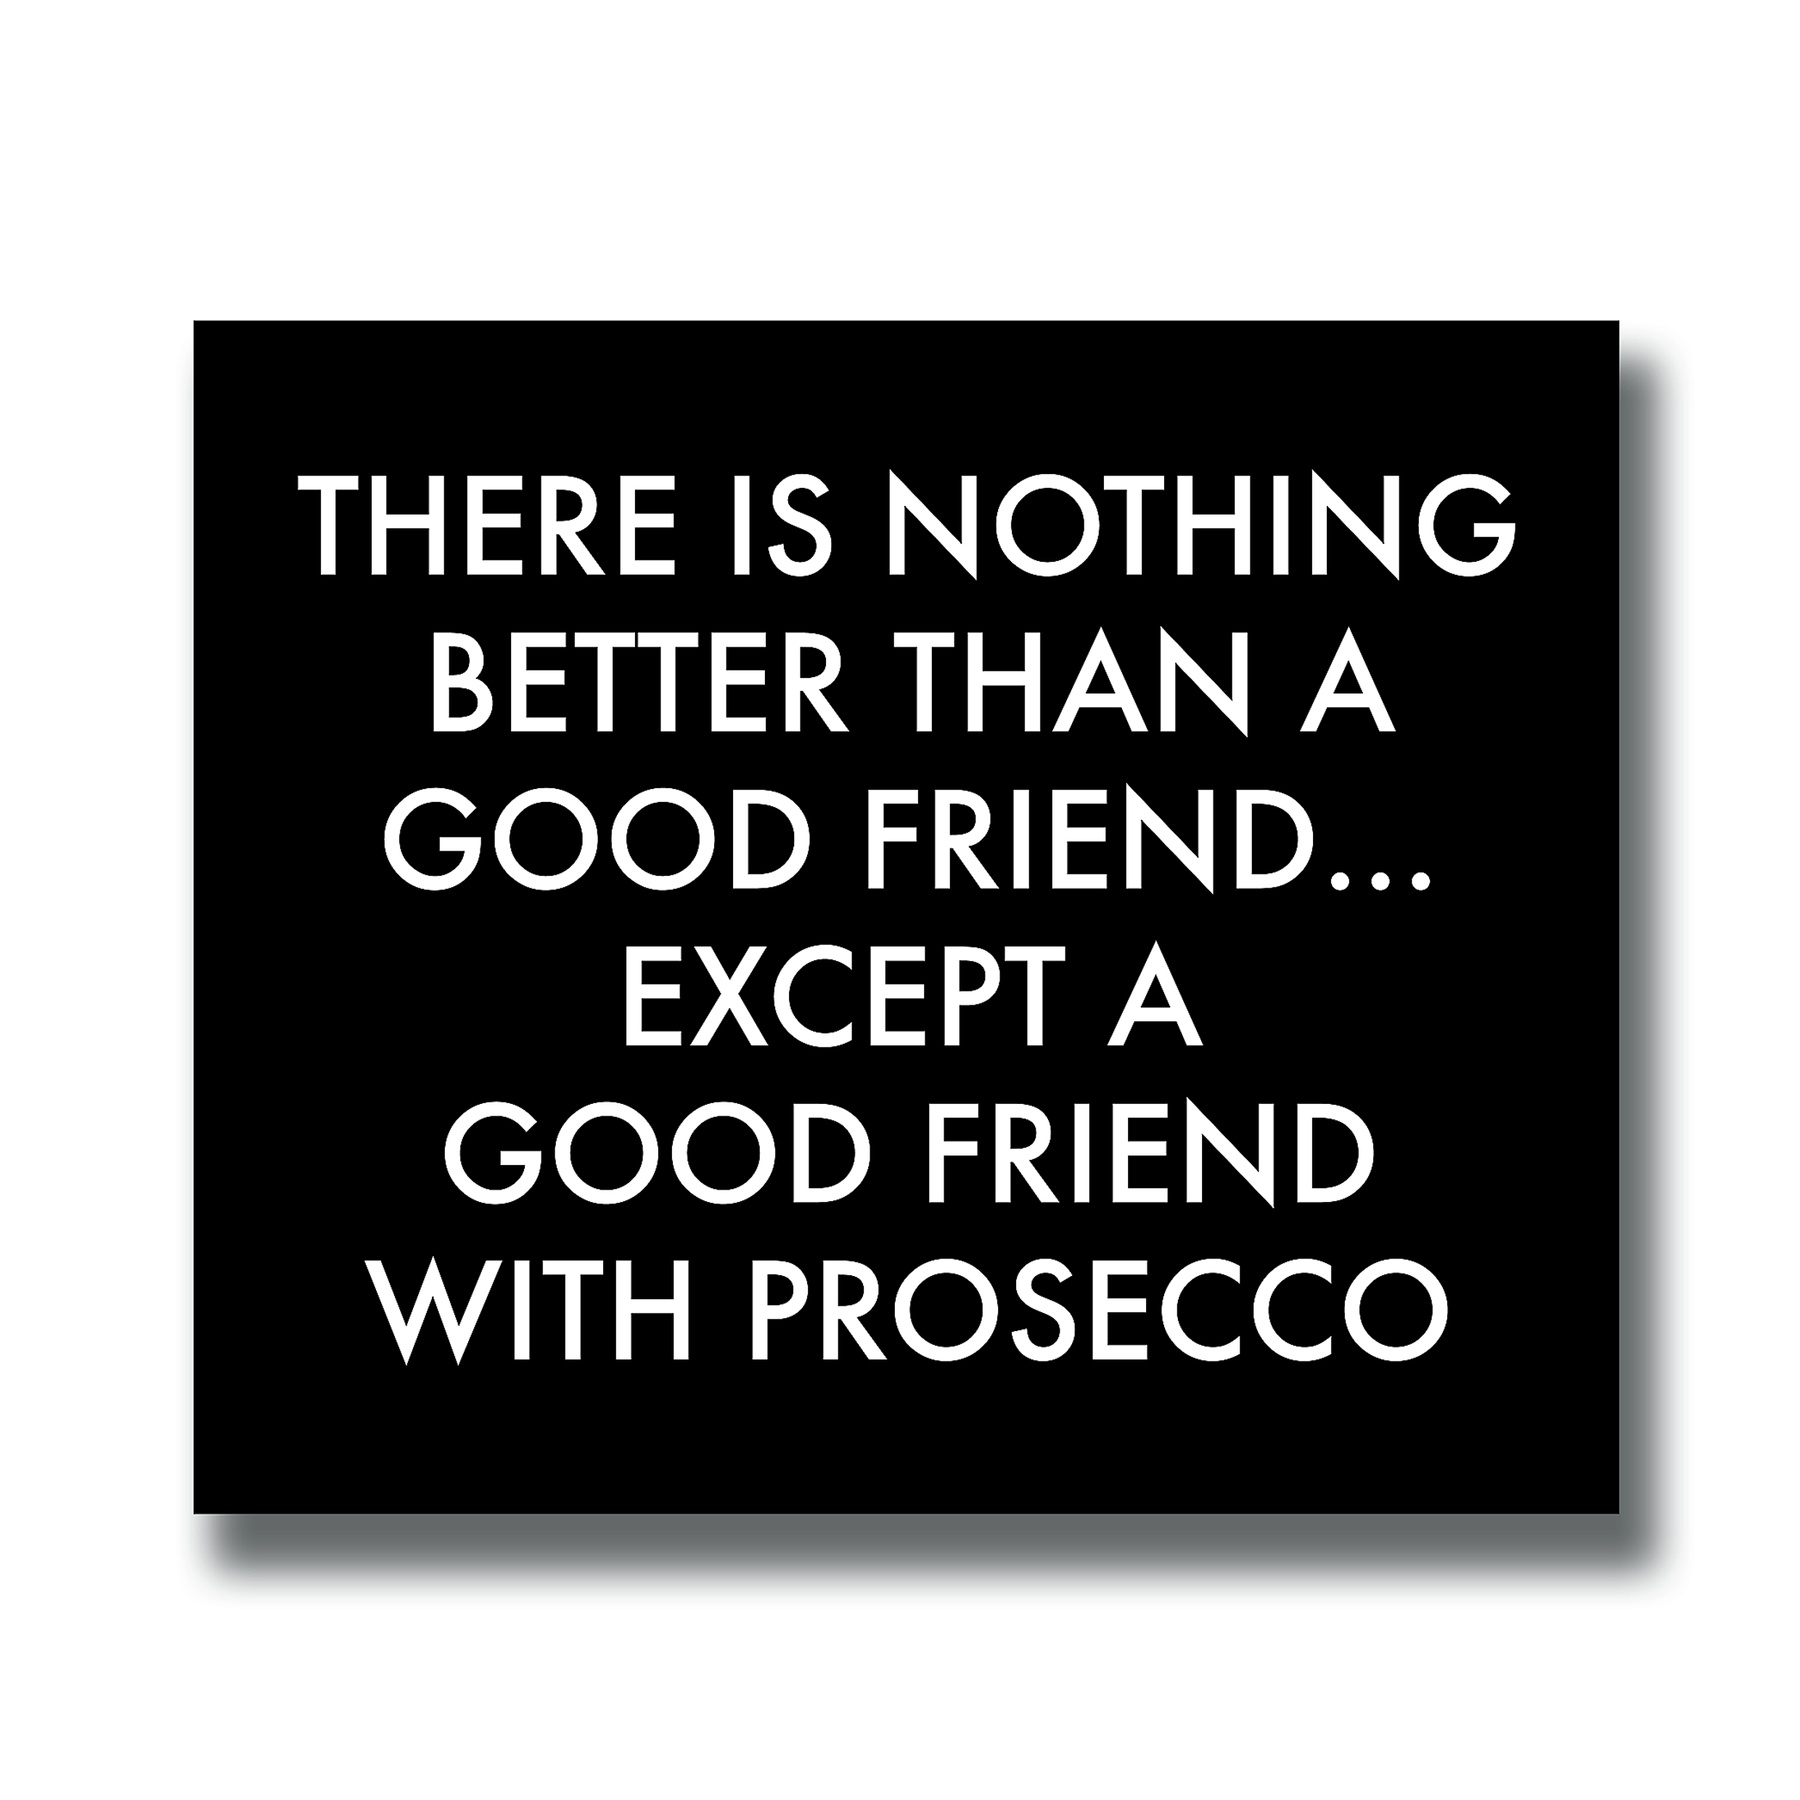 A Good Friend With Prosecco Silver Foil Plaque